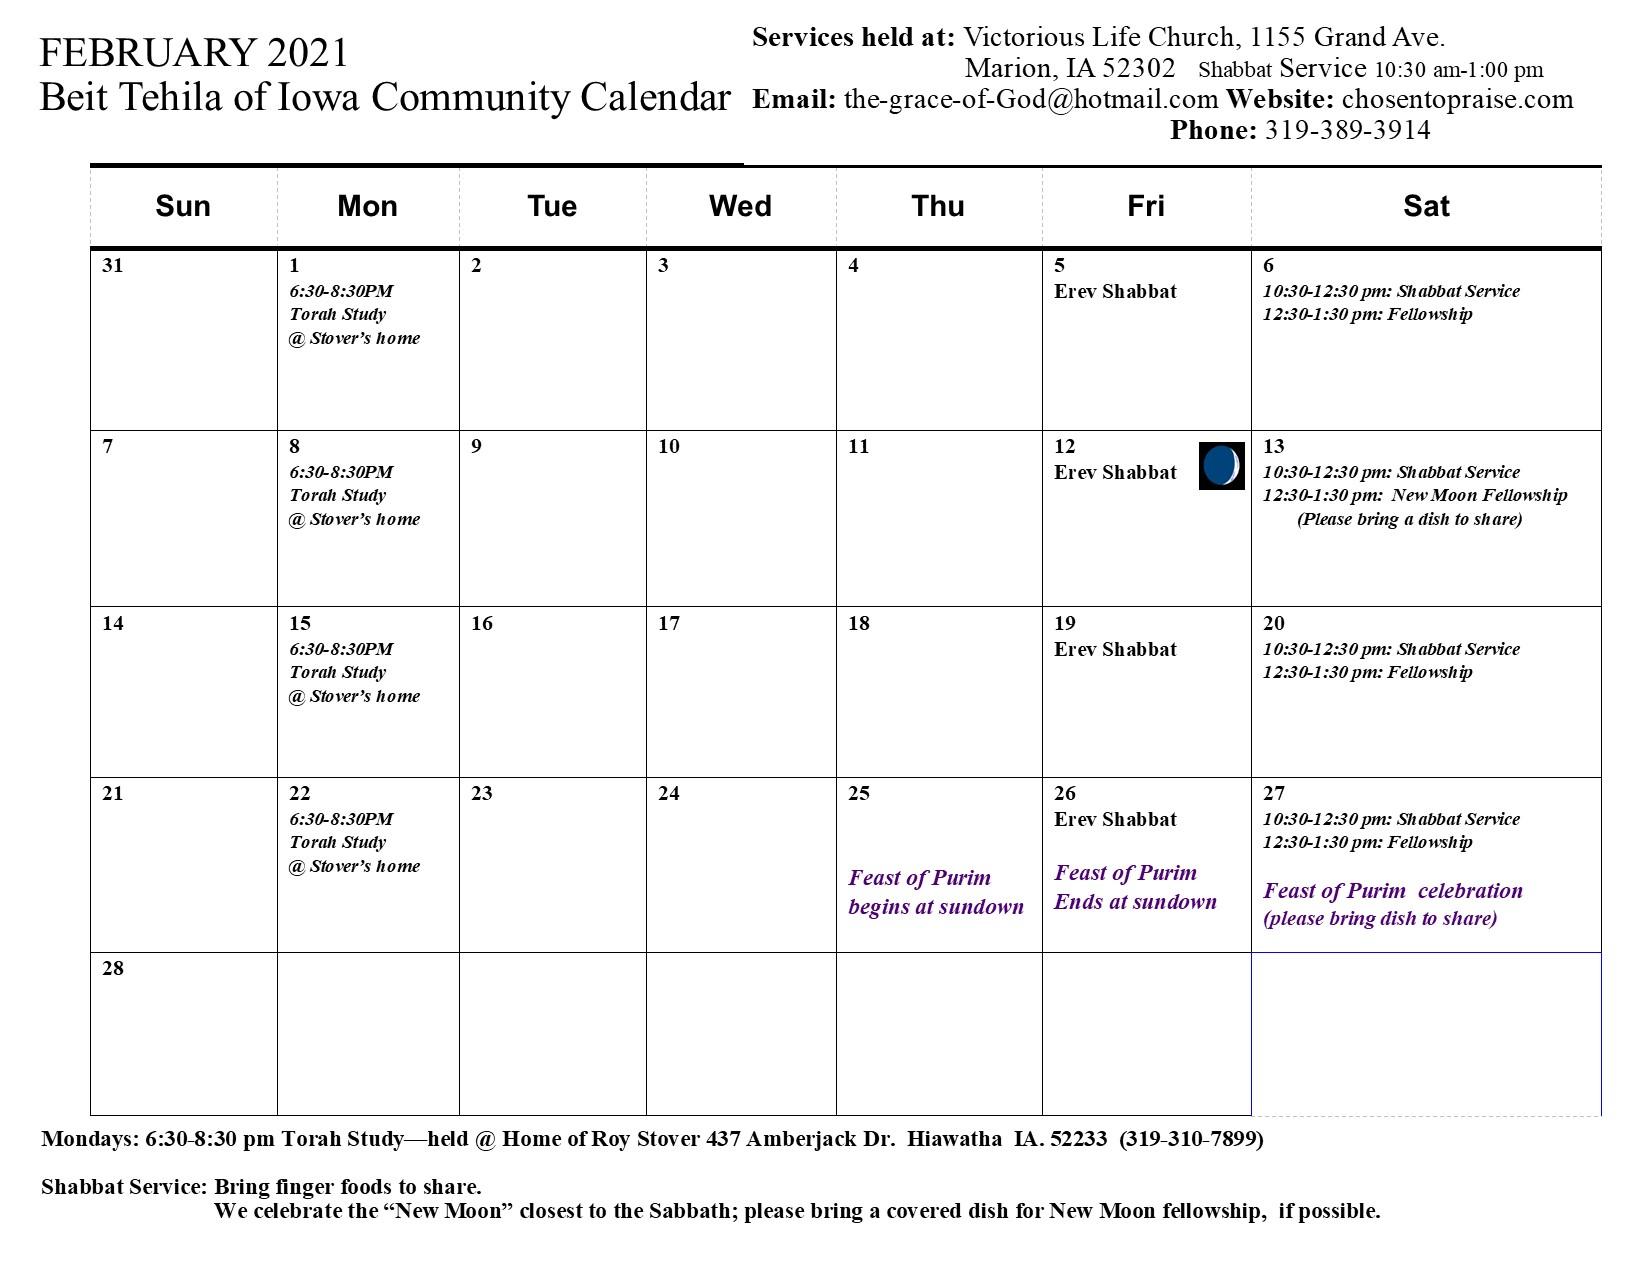 2 February 2021 Calendar